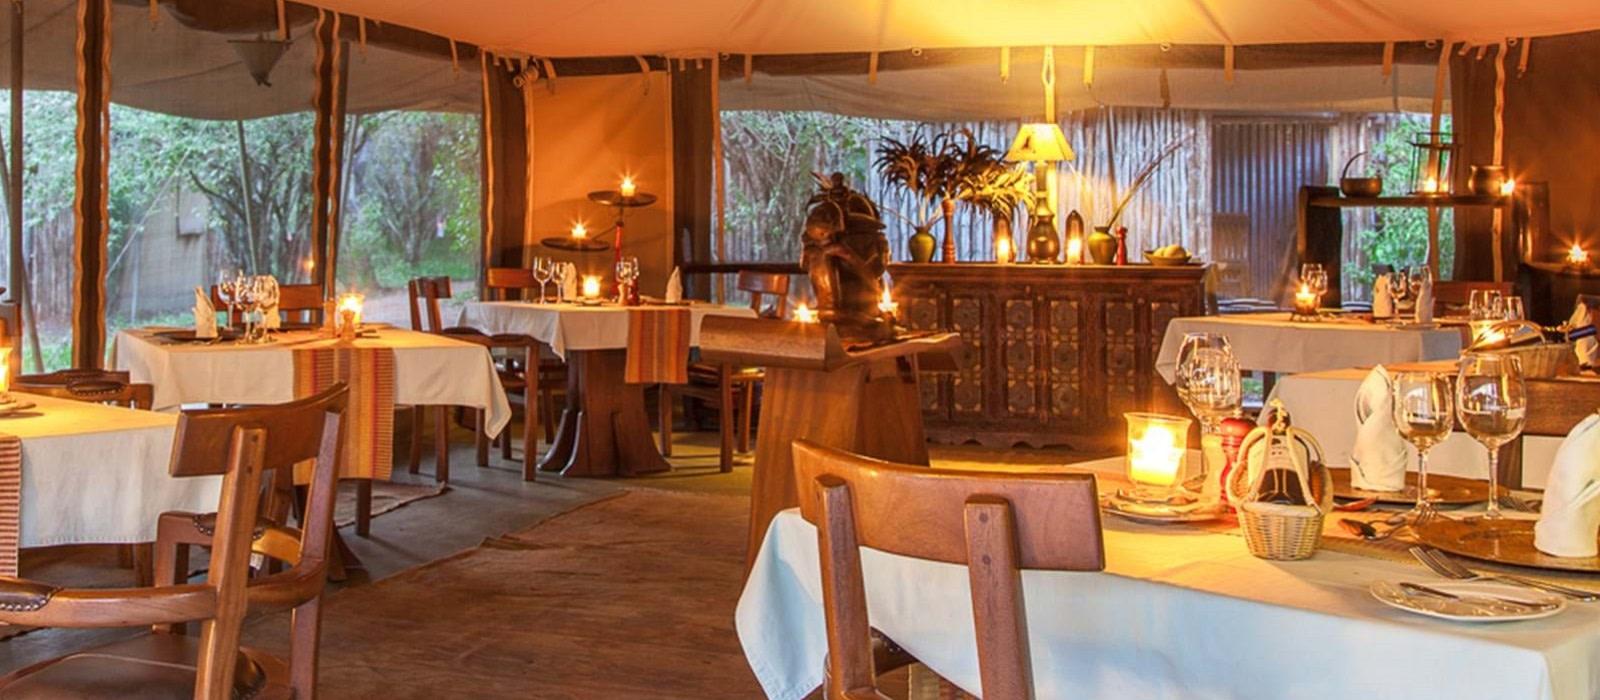 Hotel Mara Ngenche Safari Camp Kenia